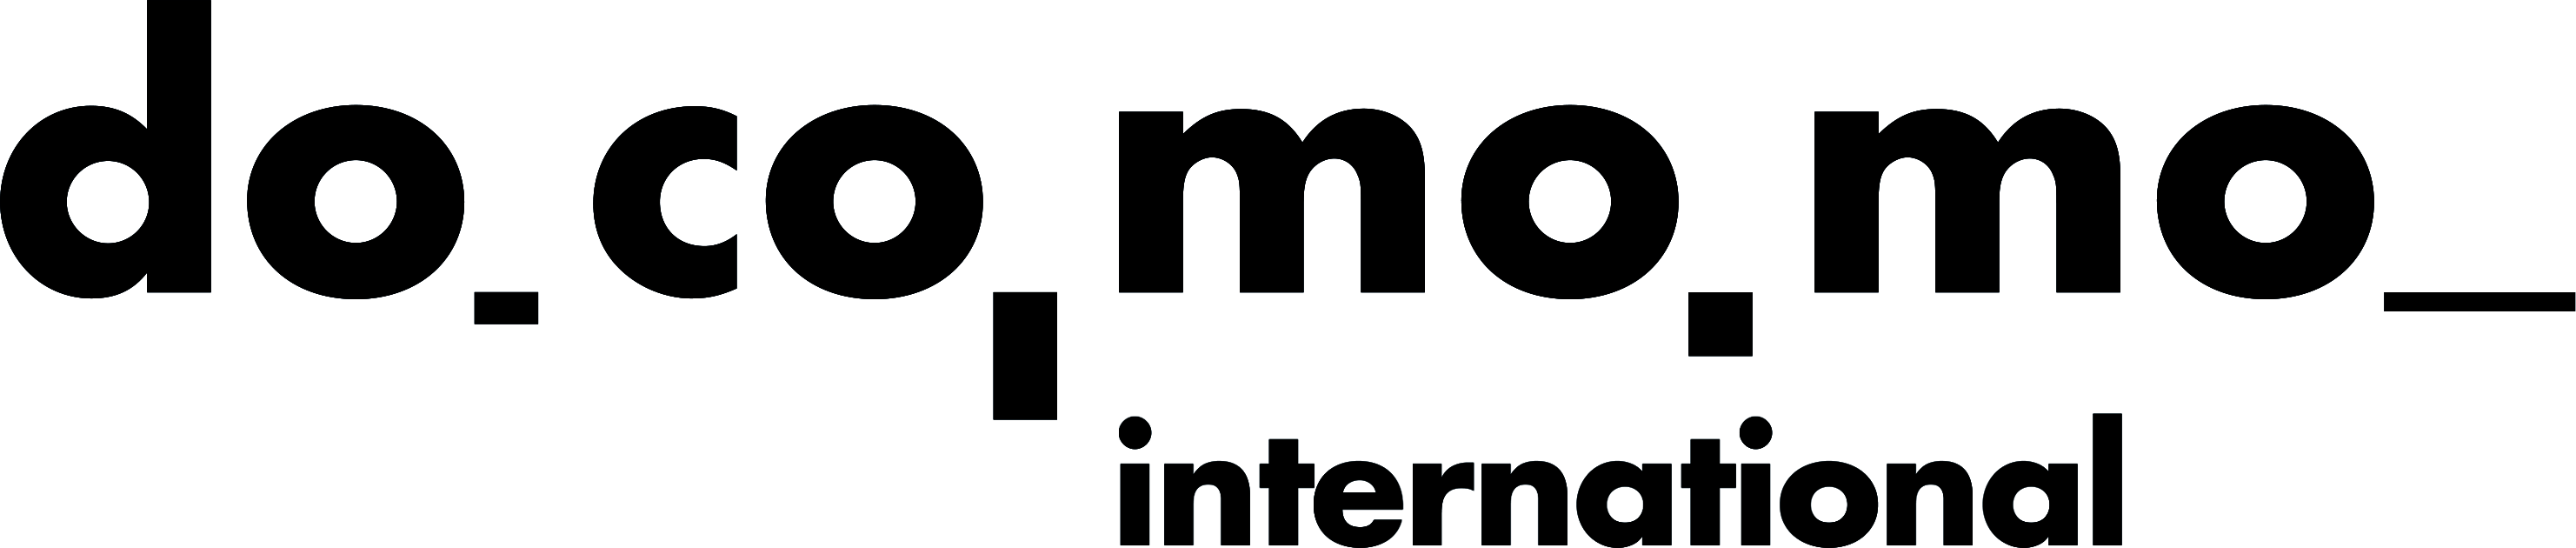 Docomomo International